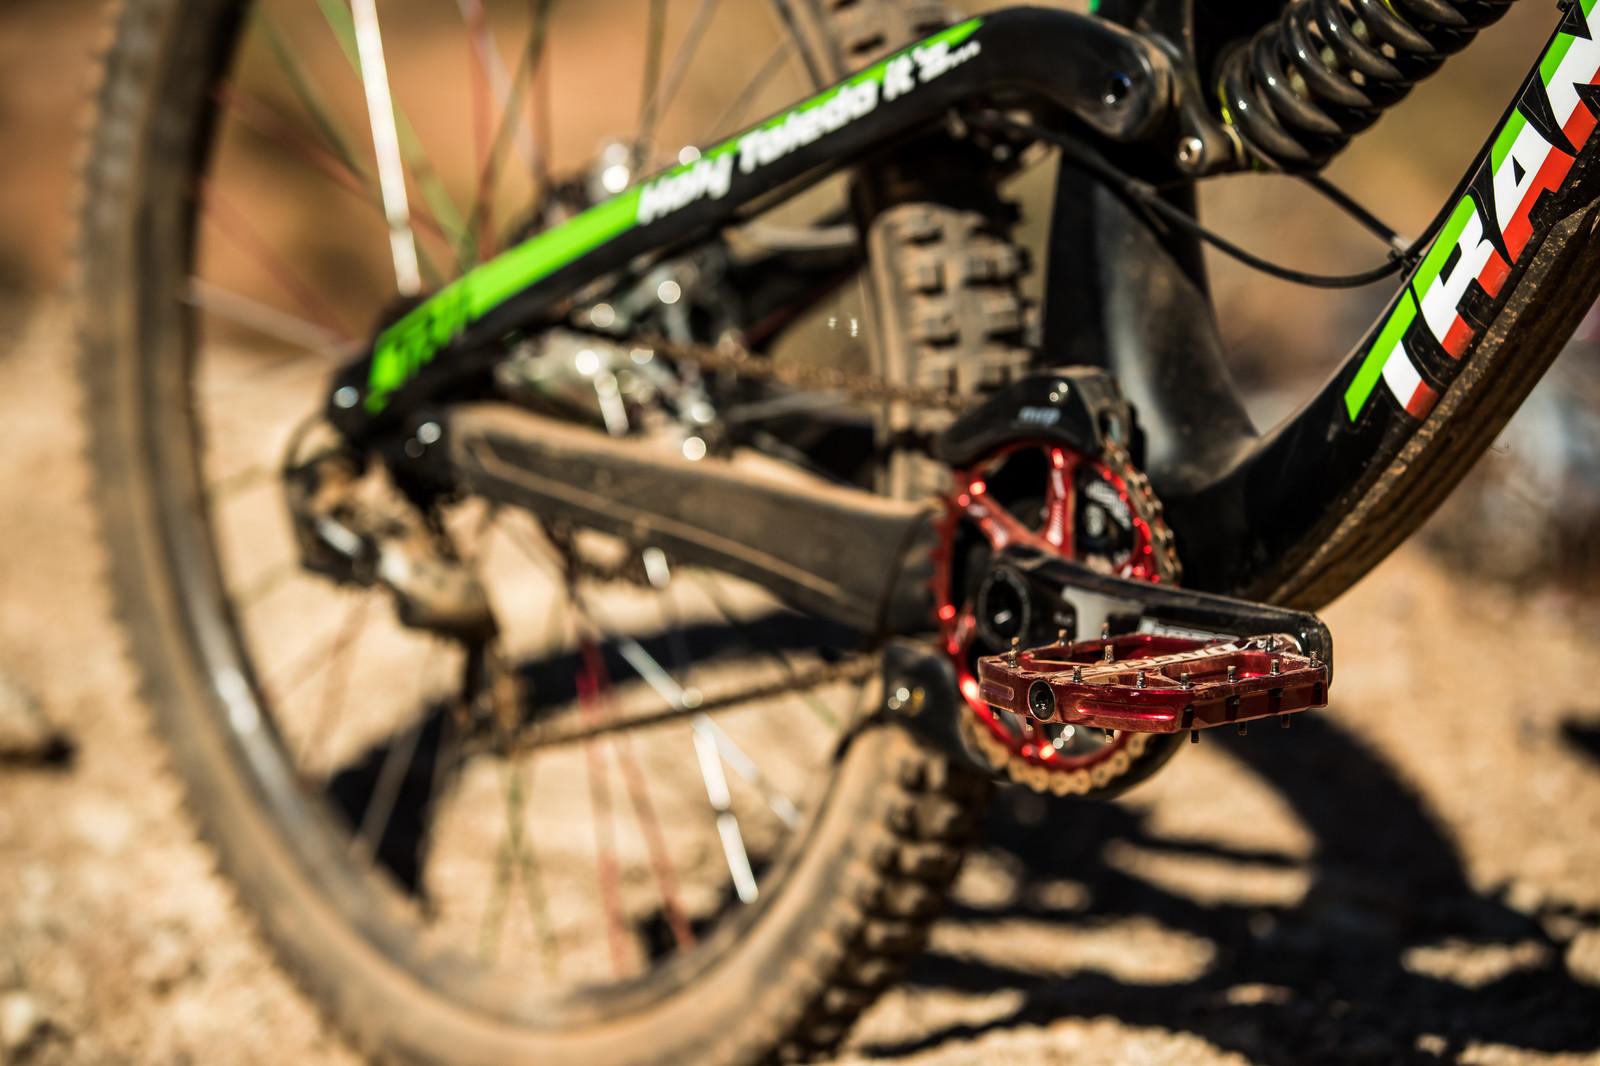 Hope Cranks on Juan Diego Salido's Transition TR11 at Rampage 2019 - RAMPAGE BIKE - Juan Diego Salido's Transition TR11 - Mountain Biking Pictures - Vital MTB